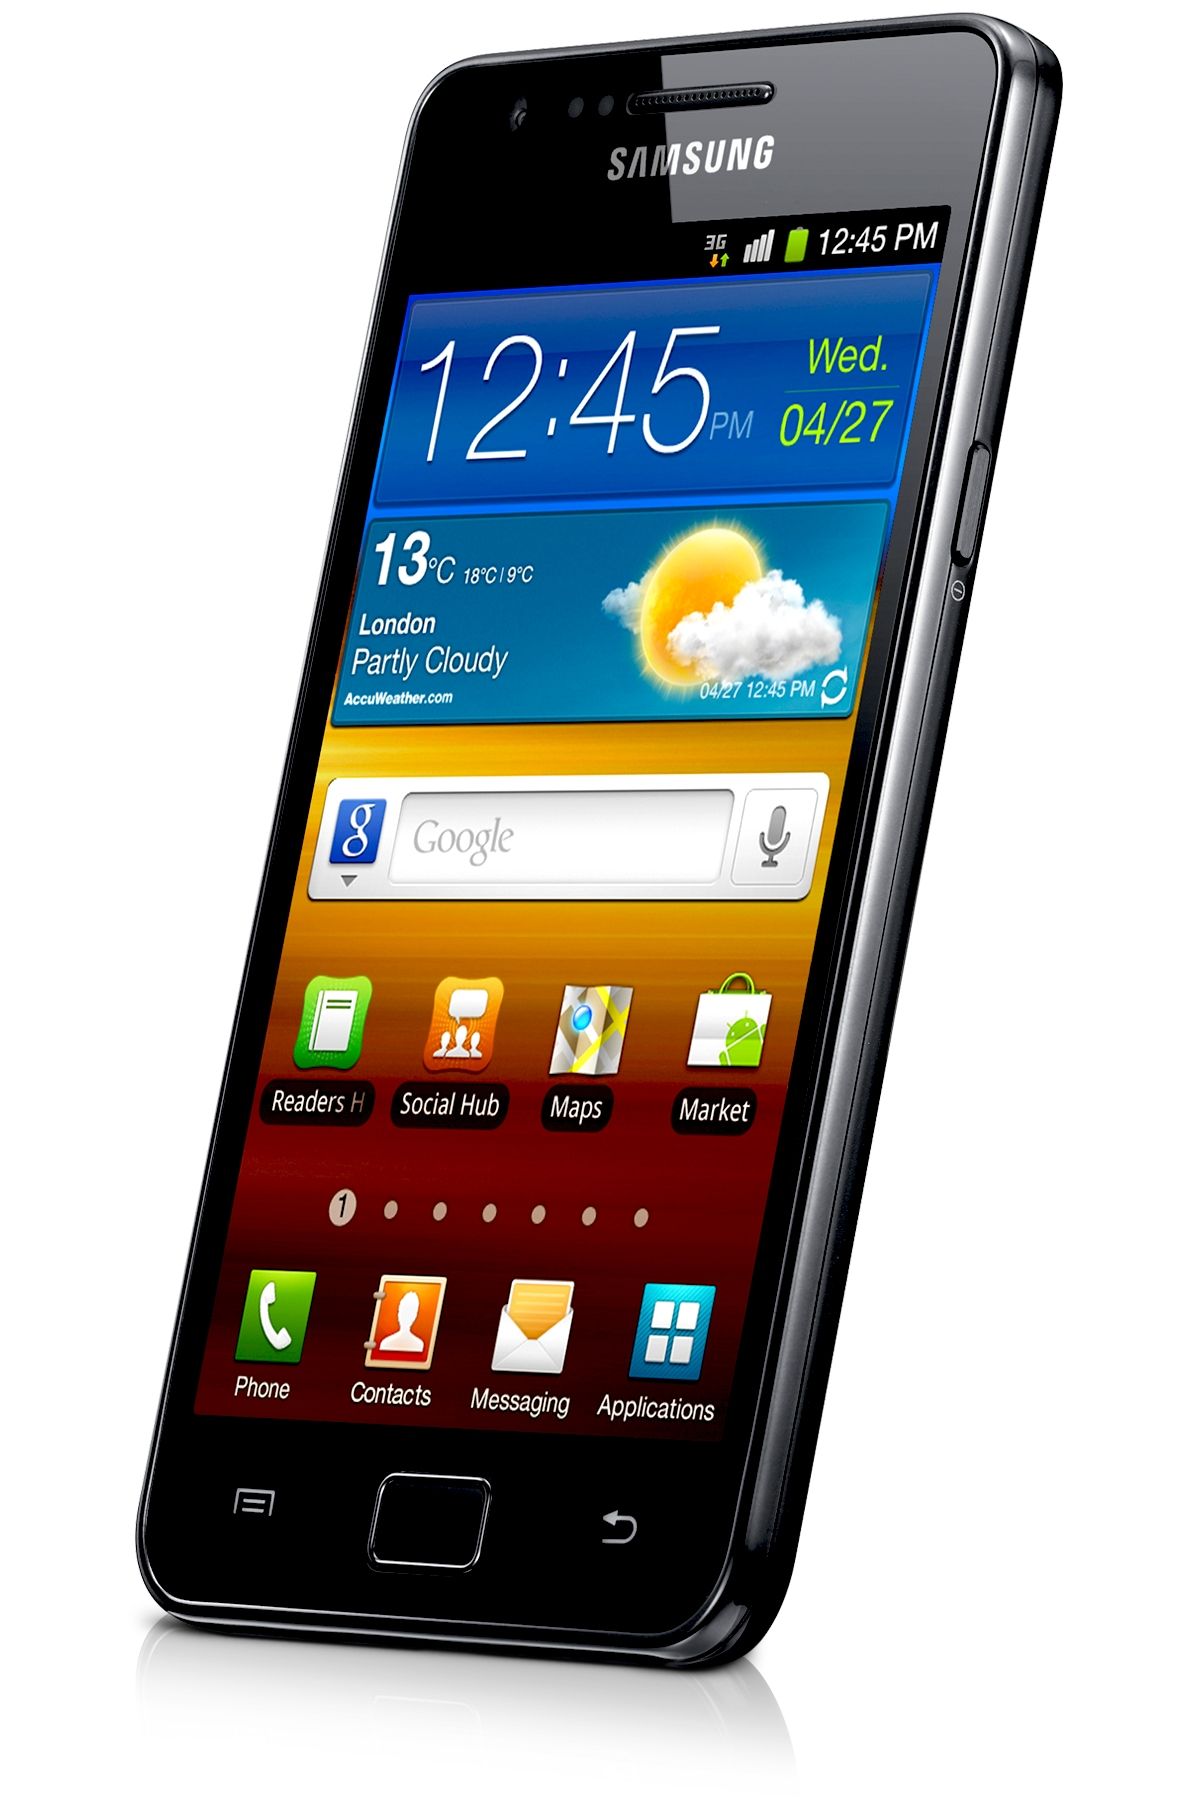 Samsung Galaxy S2 Smartphone 5 5 Display Features Black